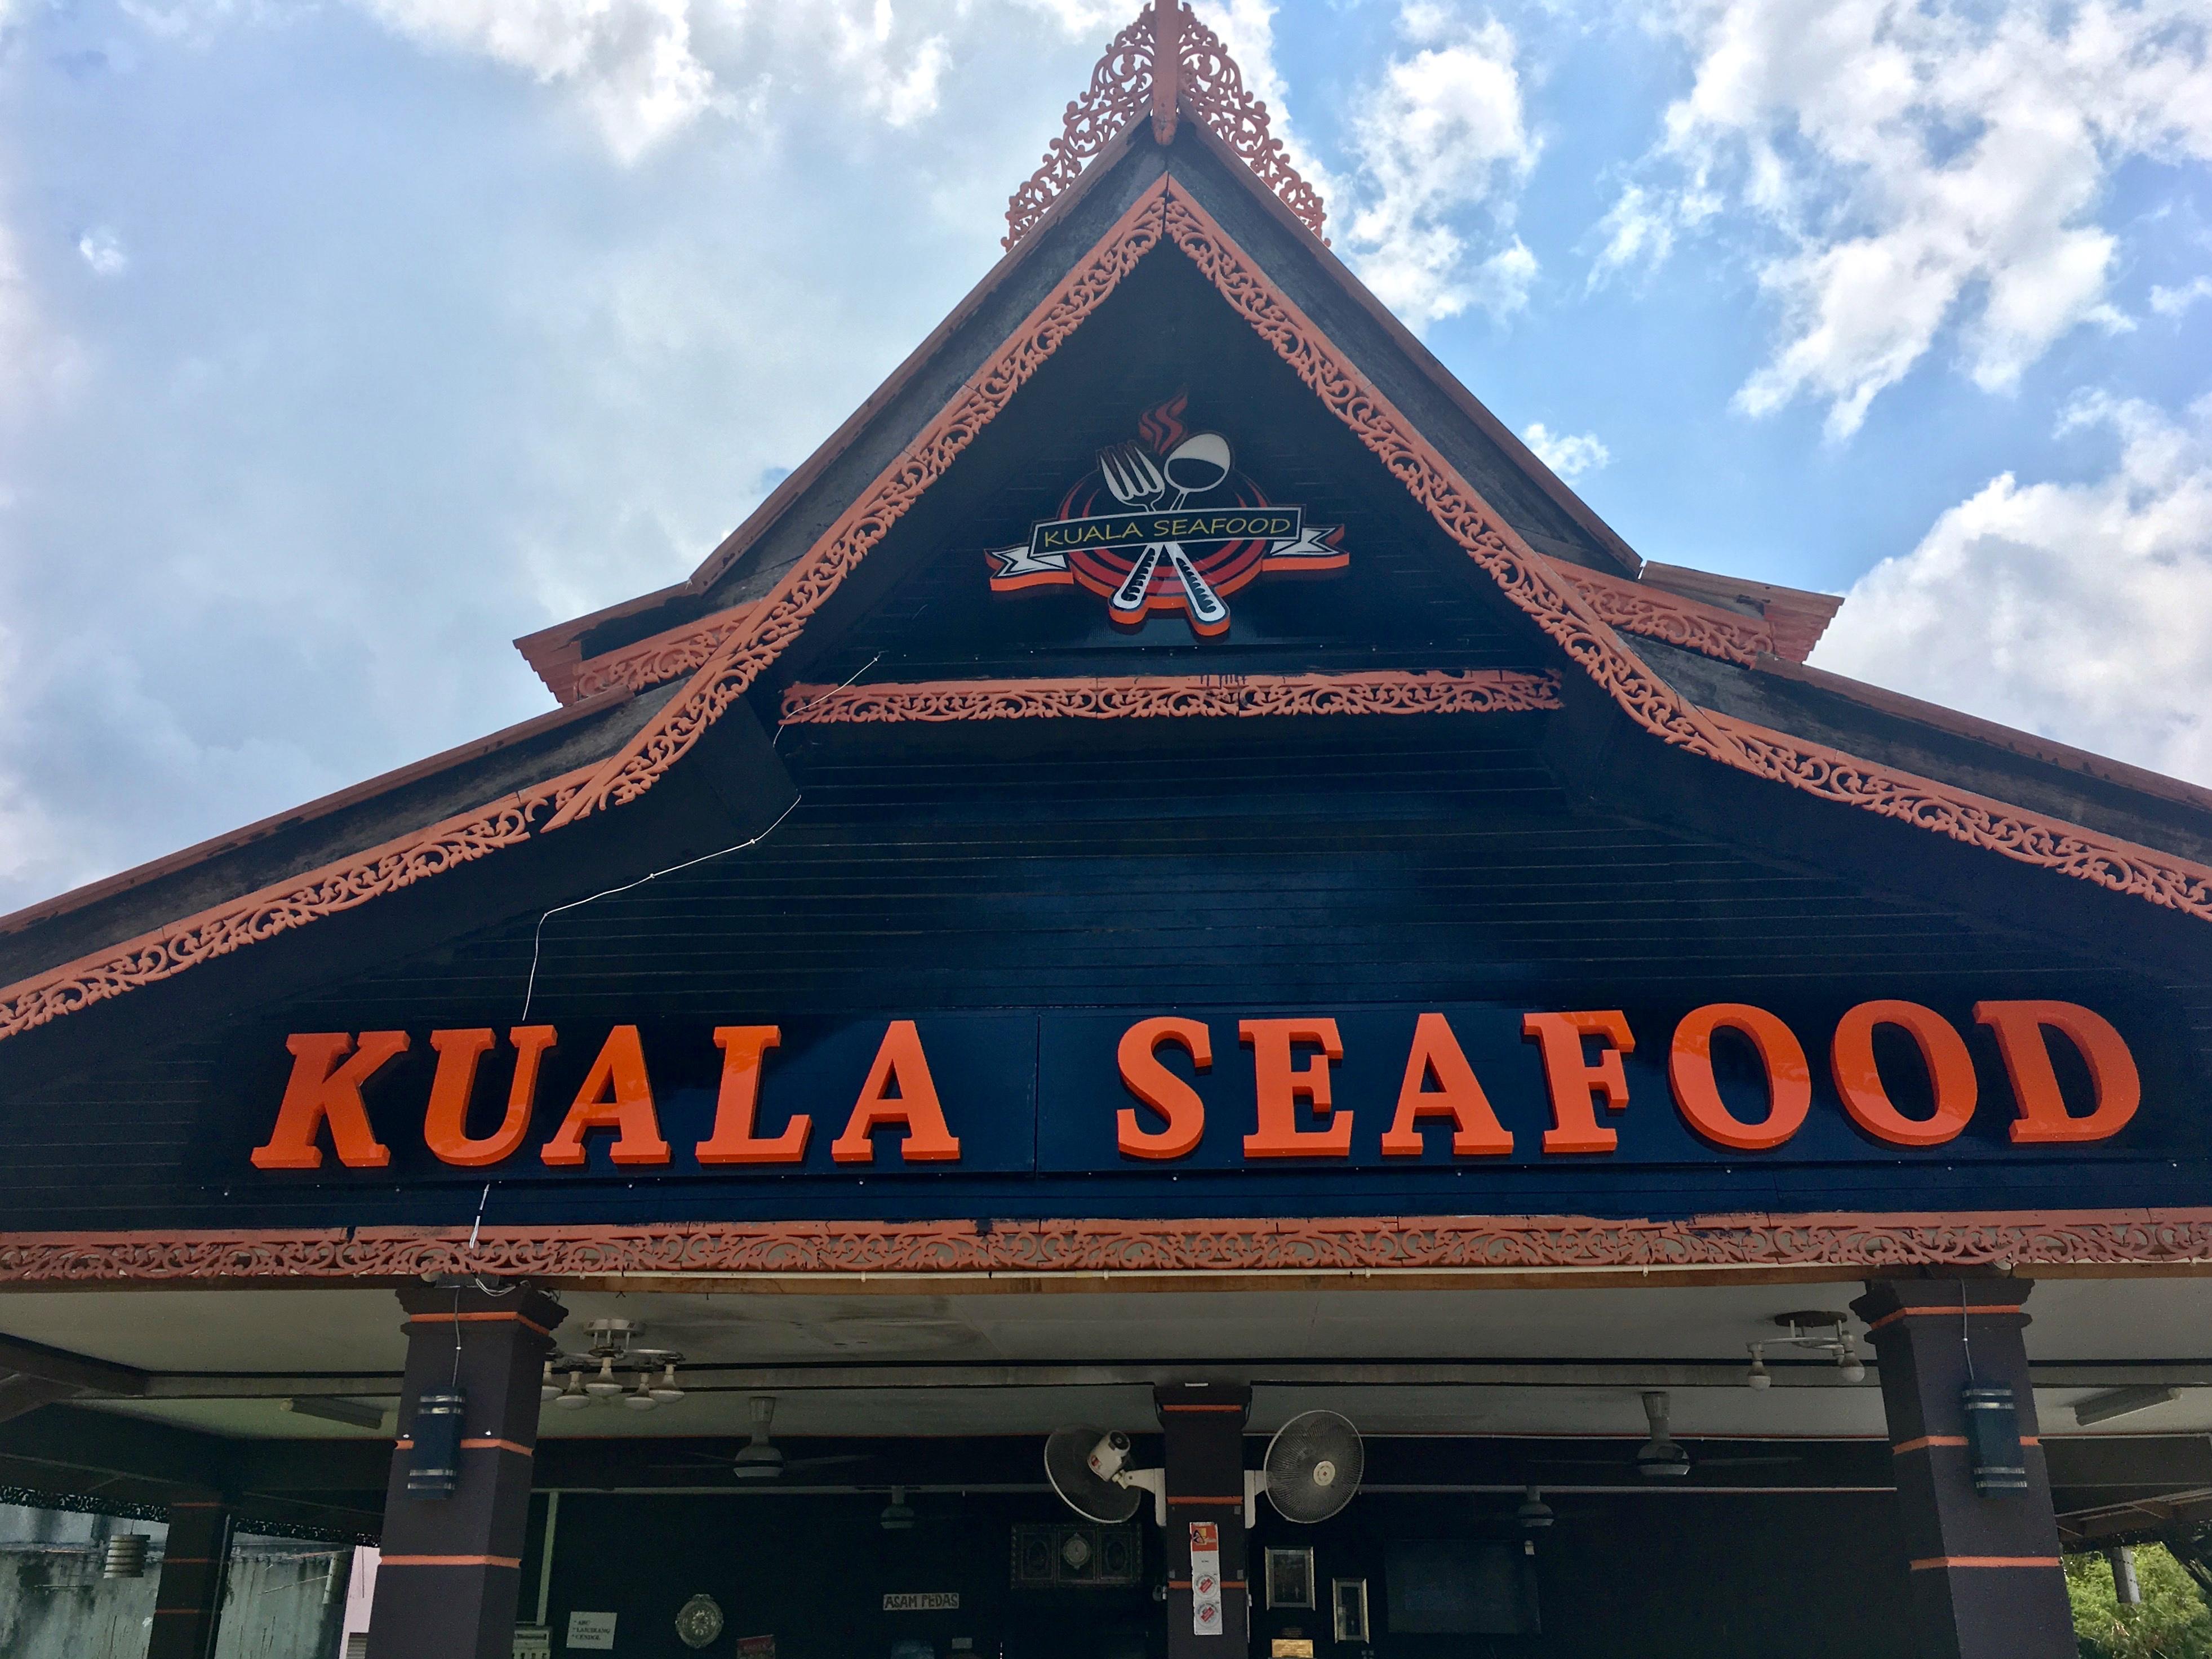 Kuala Seafood